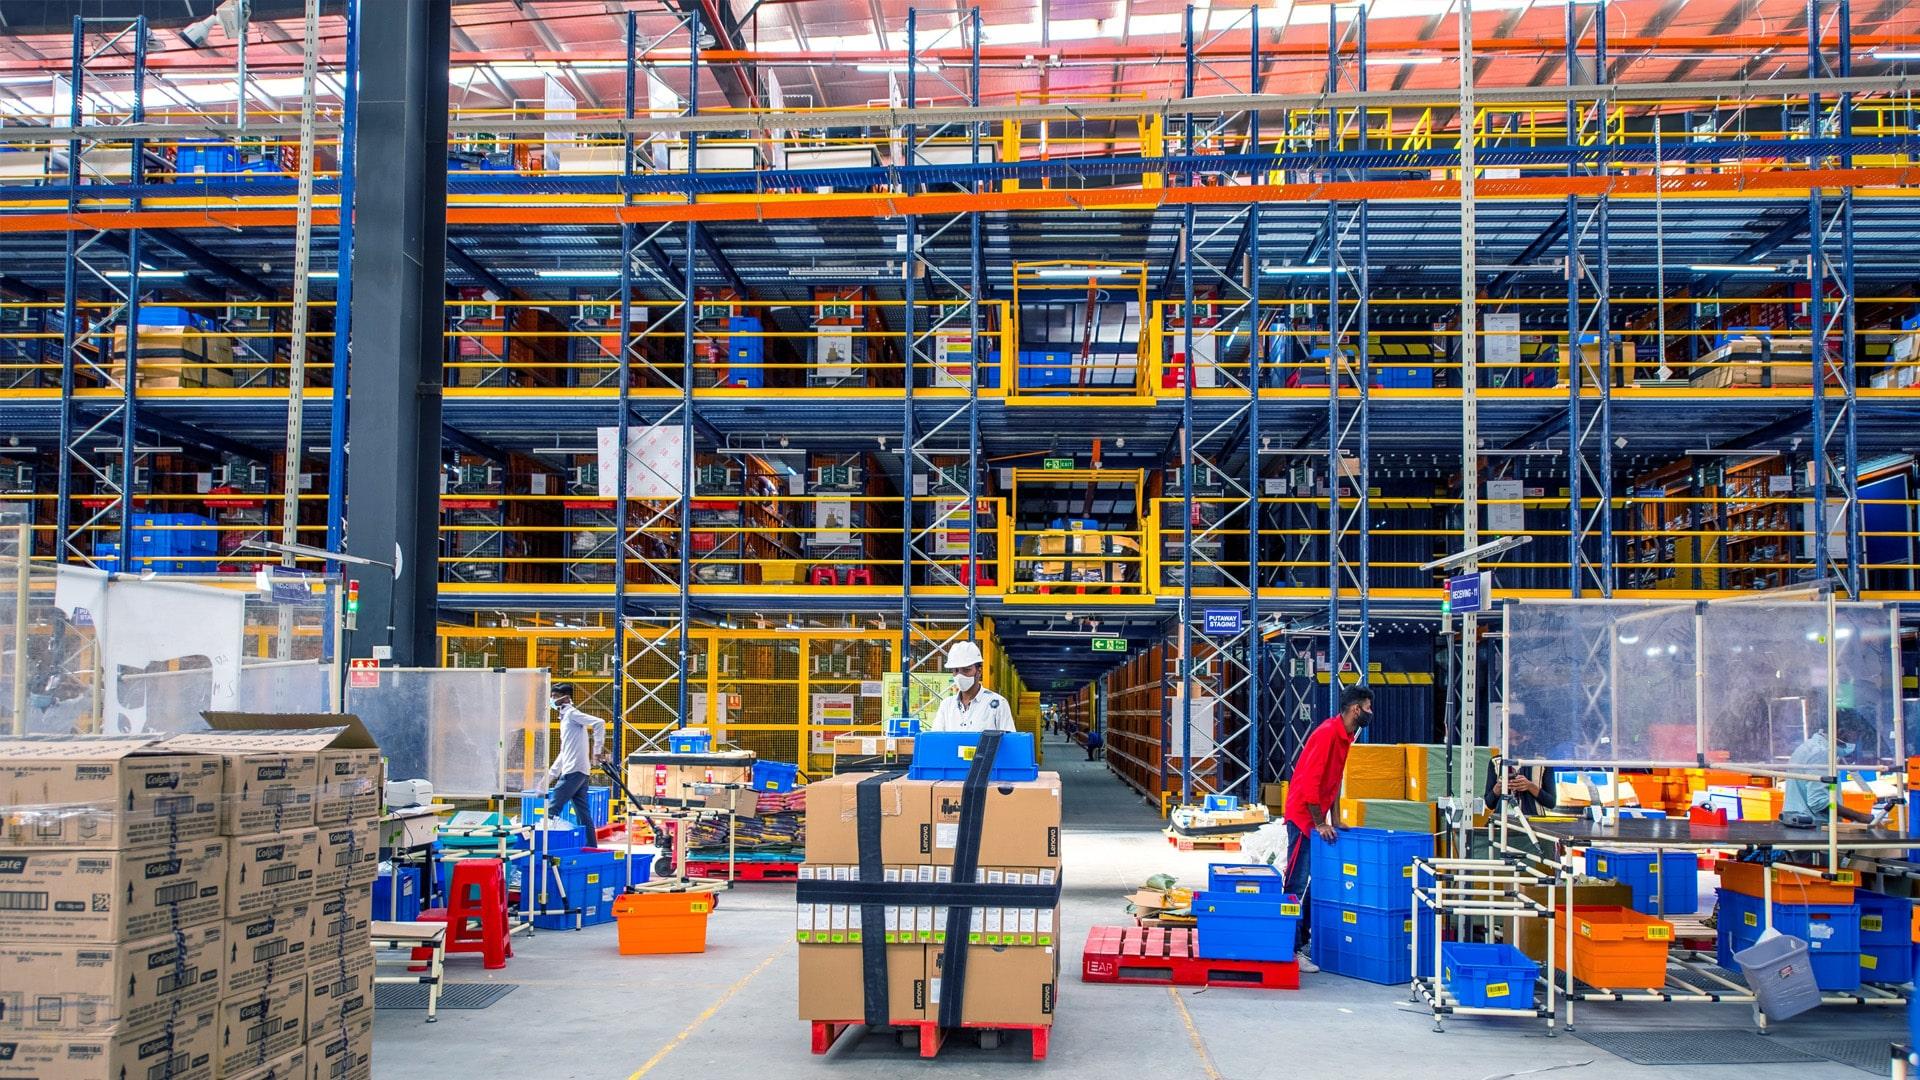 Flipkart adds 66 warehouses, sortation centres, creates 1.15 lakh seasonal job opportunities